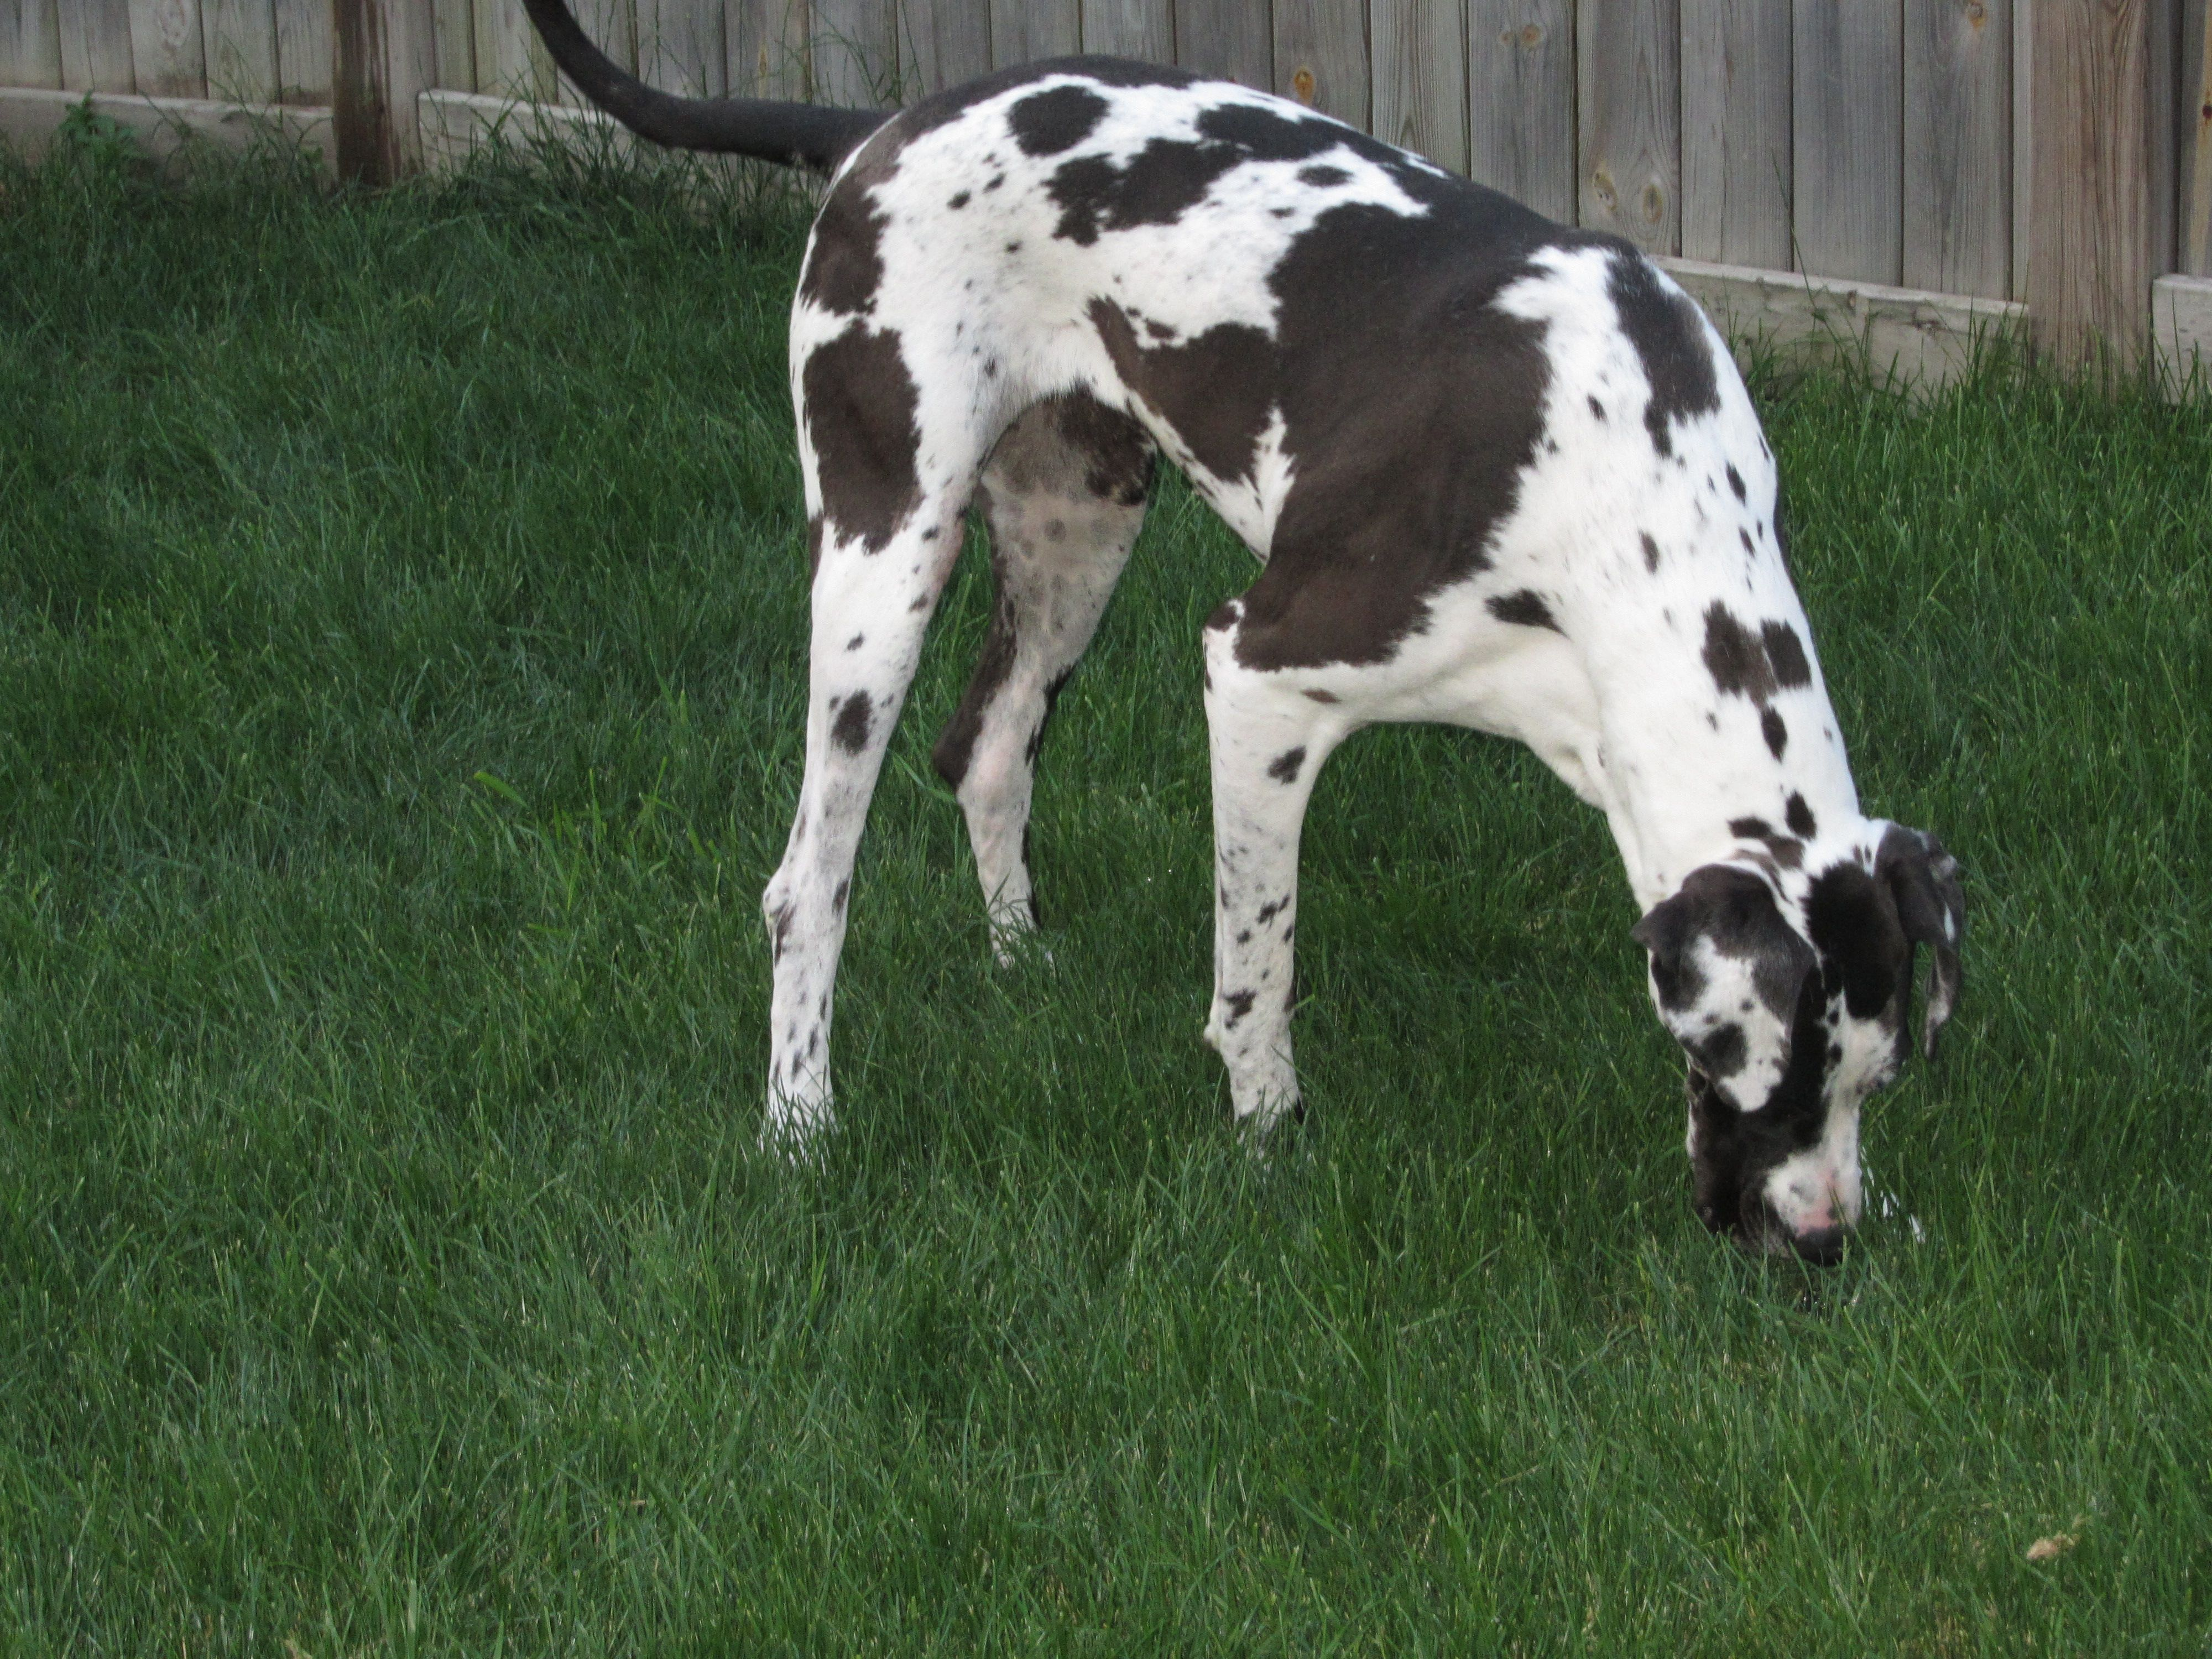 Kianna Grazing Like A Cow Harlequin Great Dane Great Dane Dogs